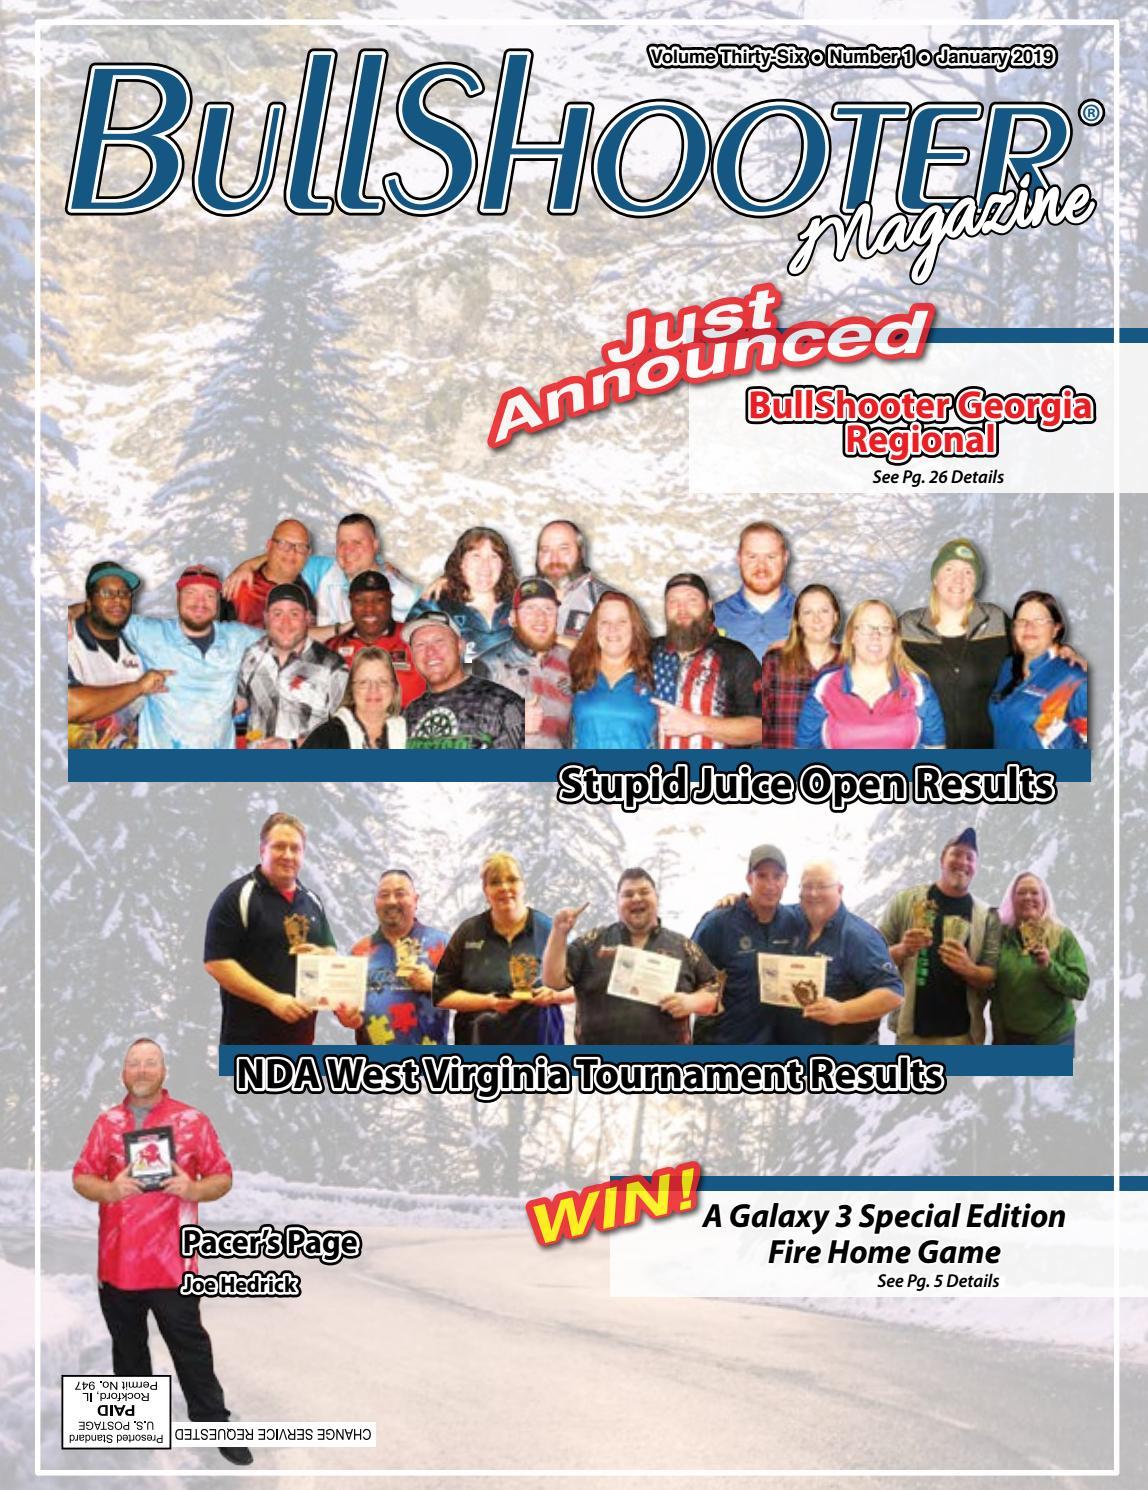 BullShooter Volume Thirty-Six Number 1 January 2019 by